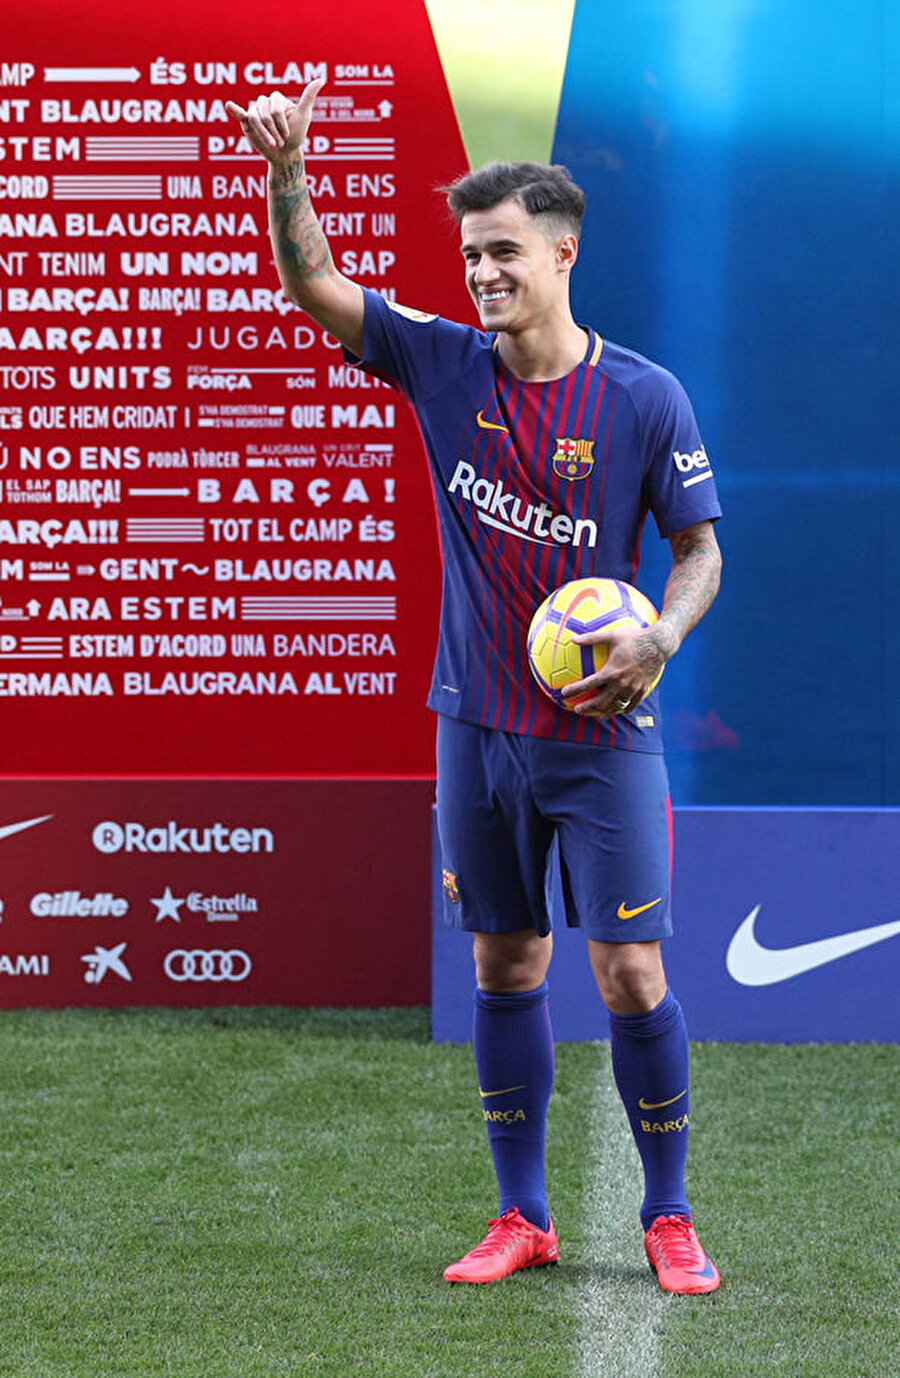 Philippe Coutinho Brezilyalı futbolcu Liverpool'dan Barcelona'ya 120 milyon Euro'ya transfer oldu.